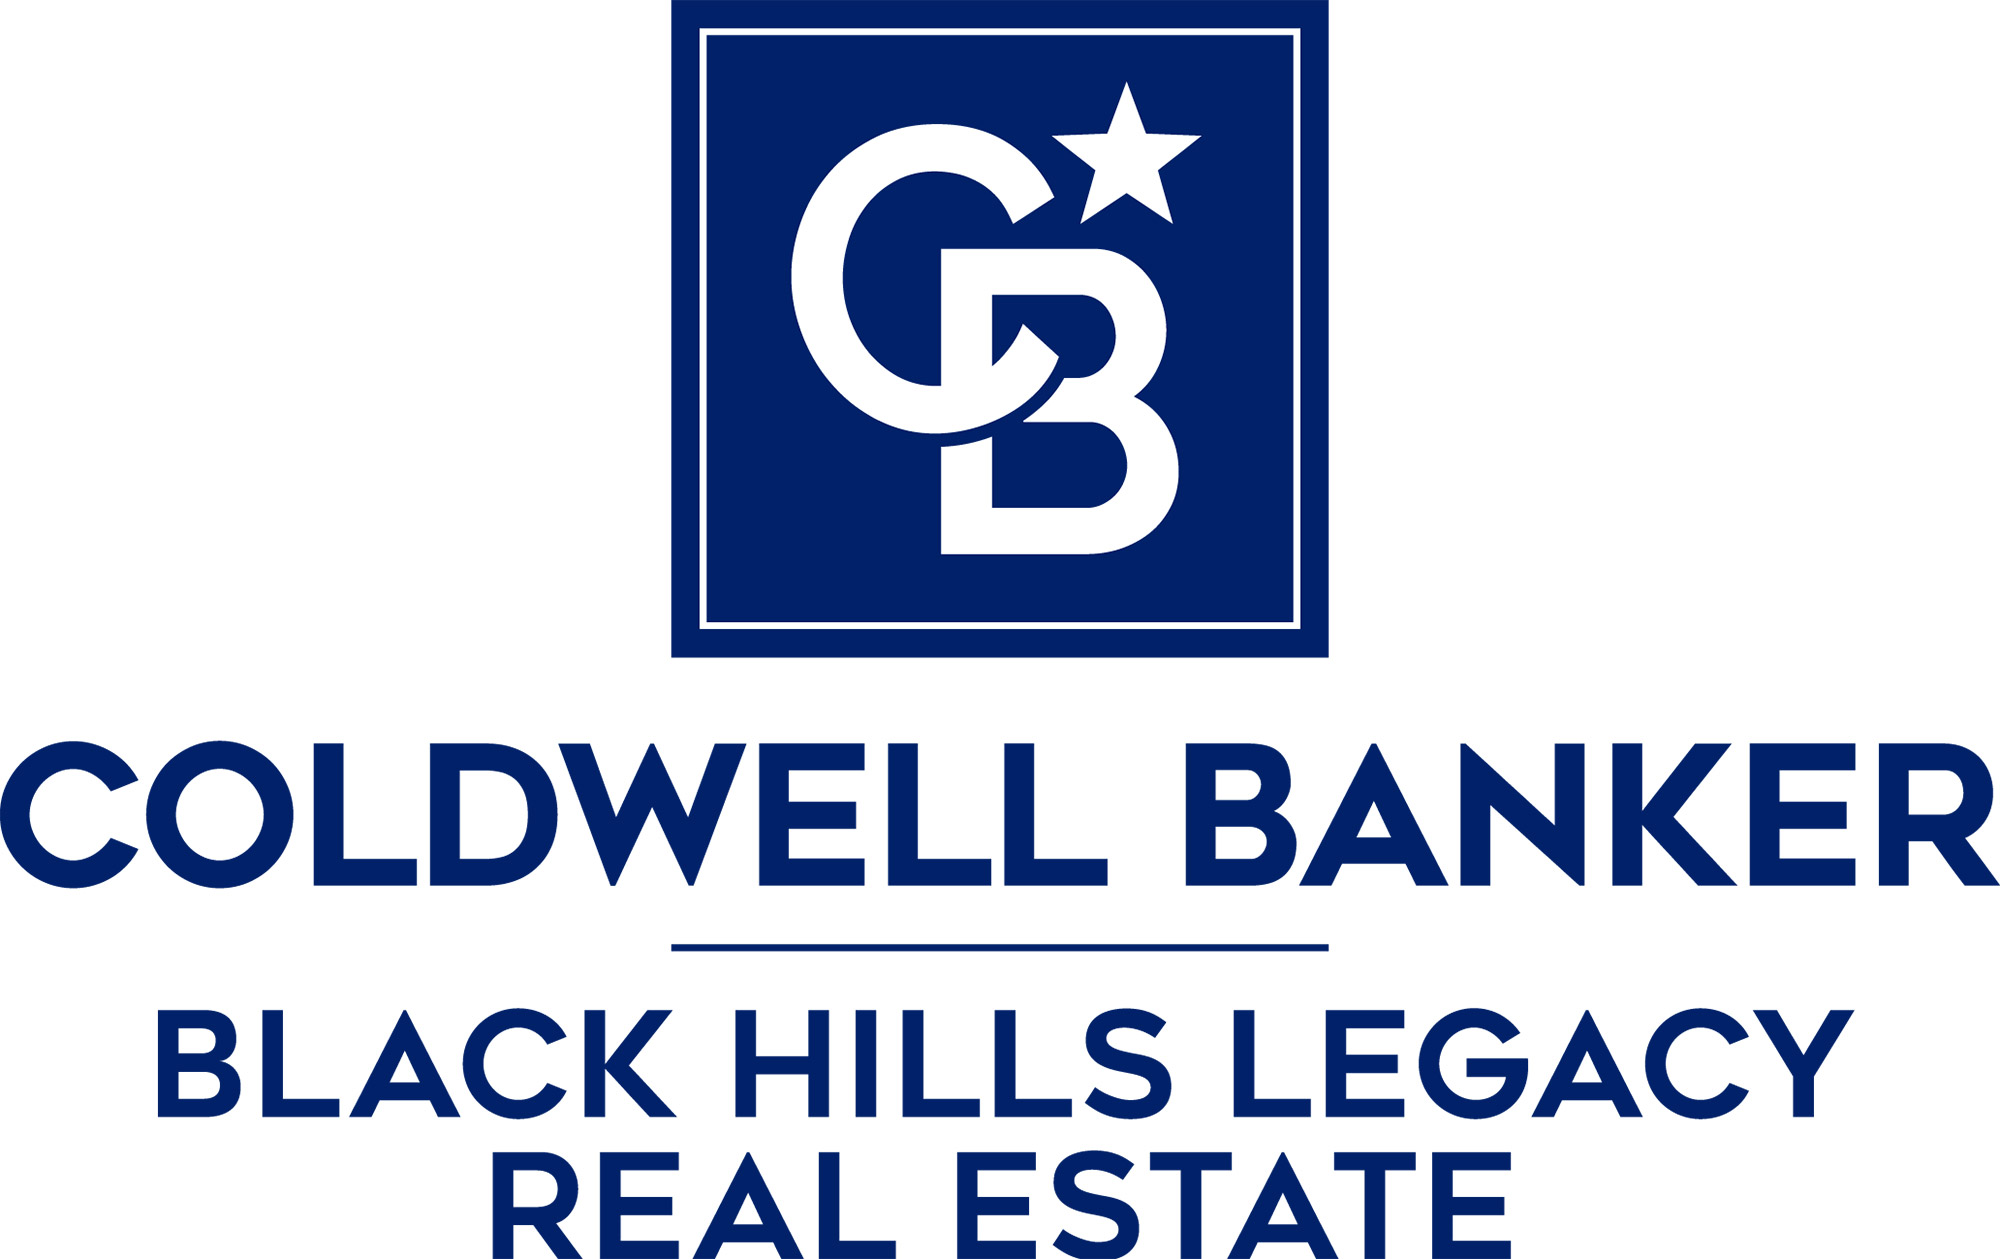 Rapid City and Black Hills Real Estate Market Report for October 2021